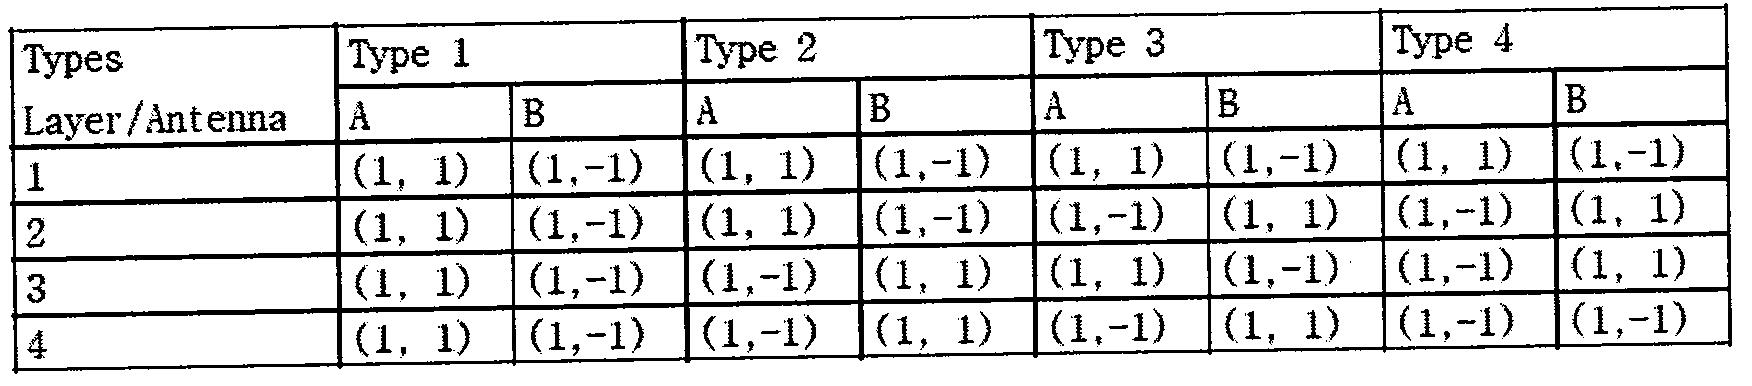 Figure 112011500951185-pat00026